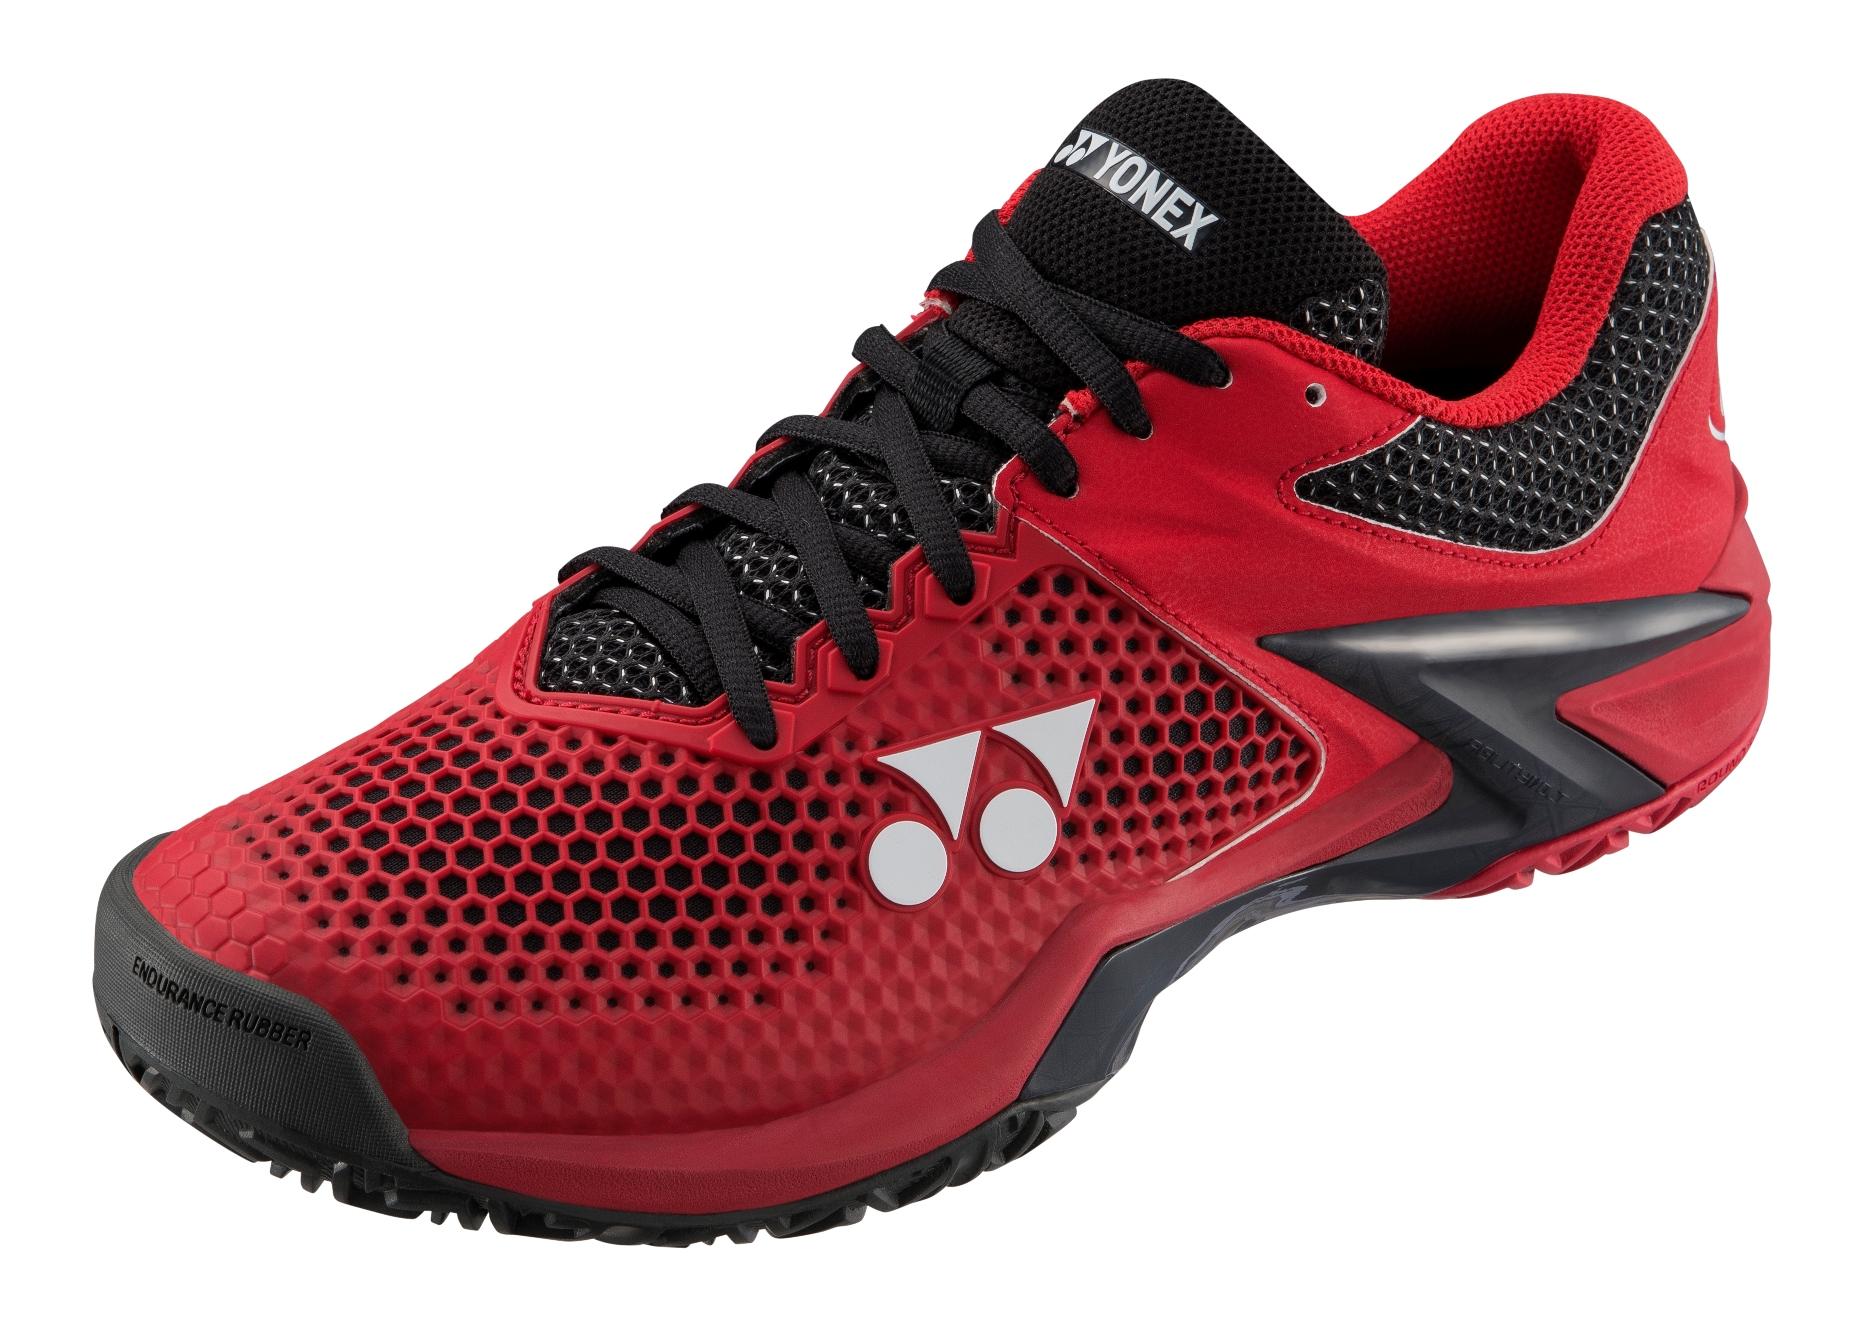 Yonex Men/'s Eclipsion2 Power Cushion Tennis Shoe Red//Black